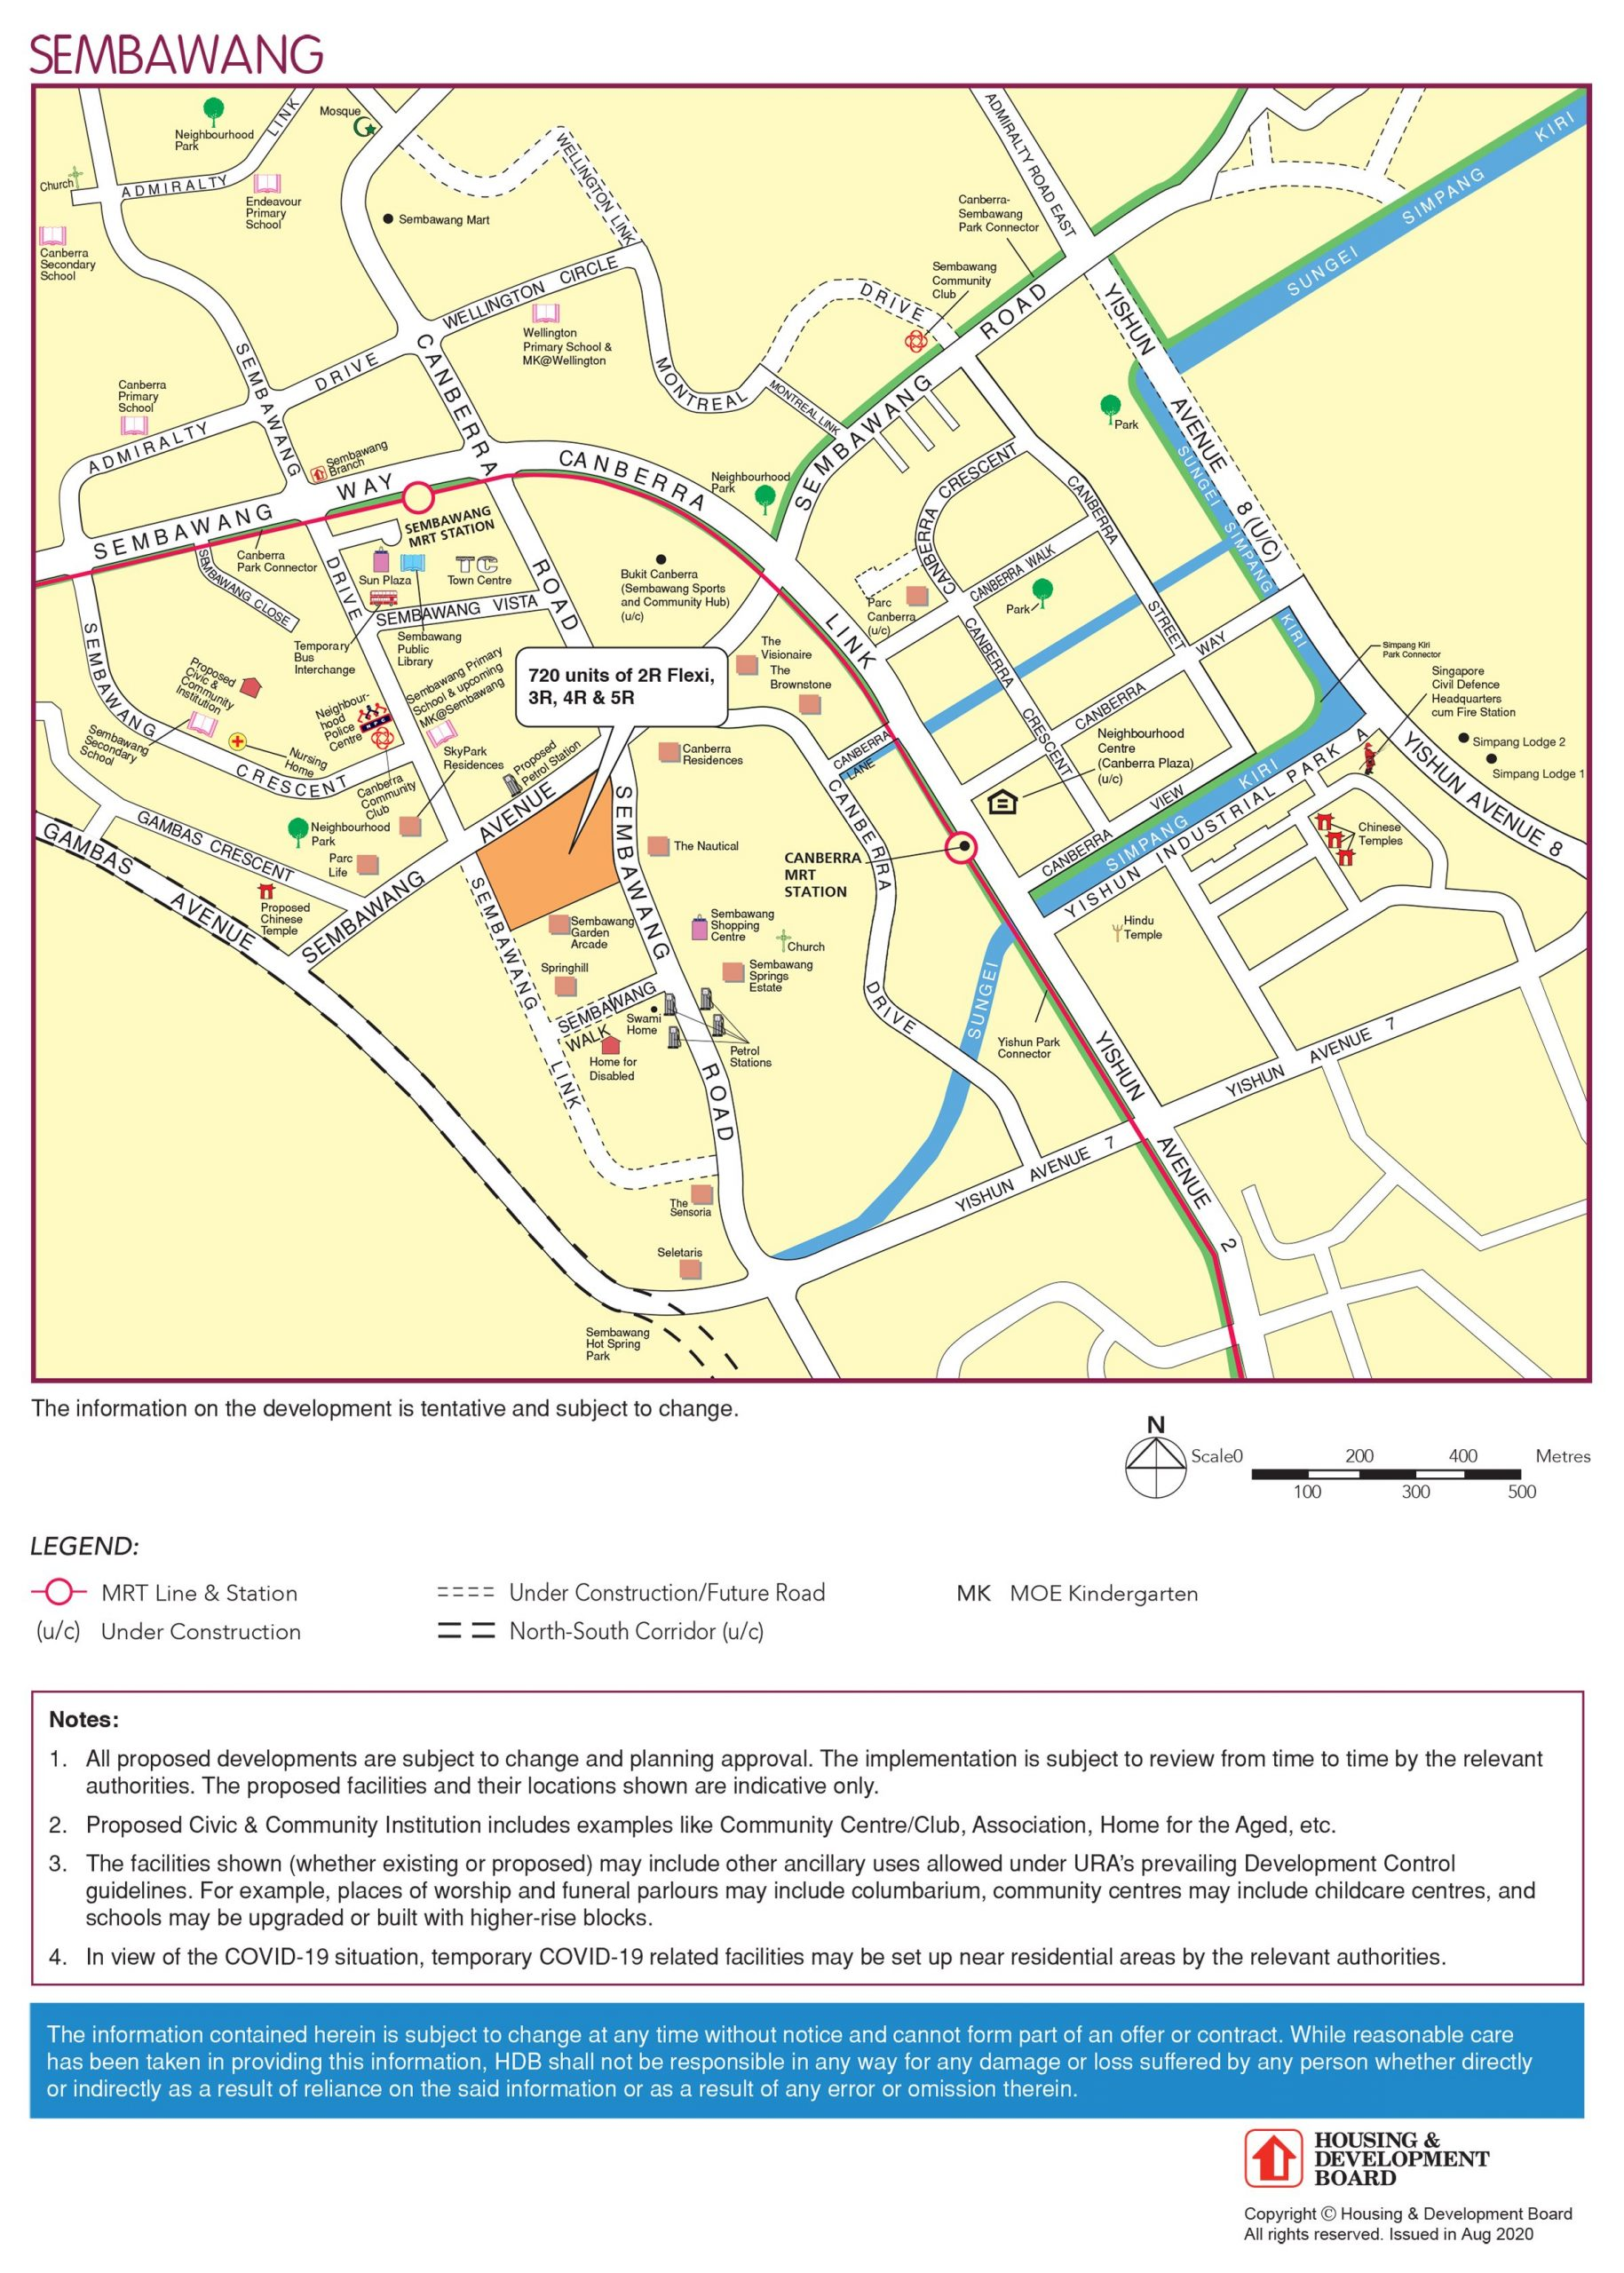 hdb sembawang bto nov 2020 map